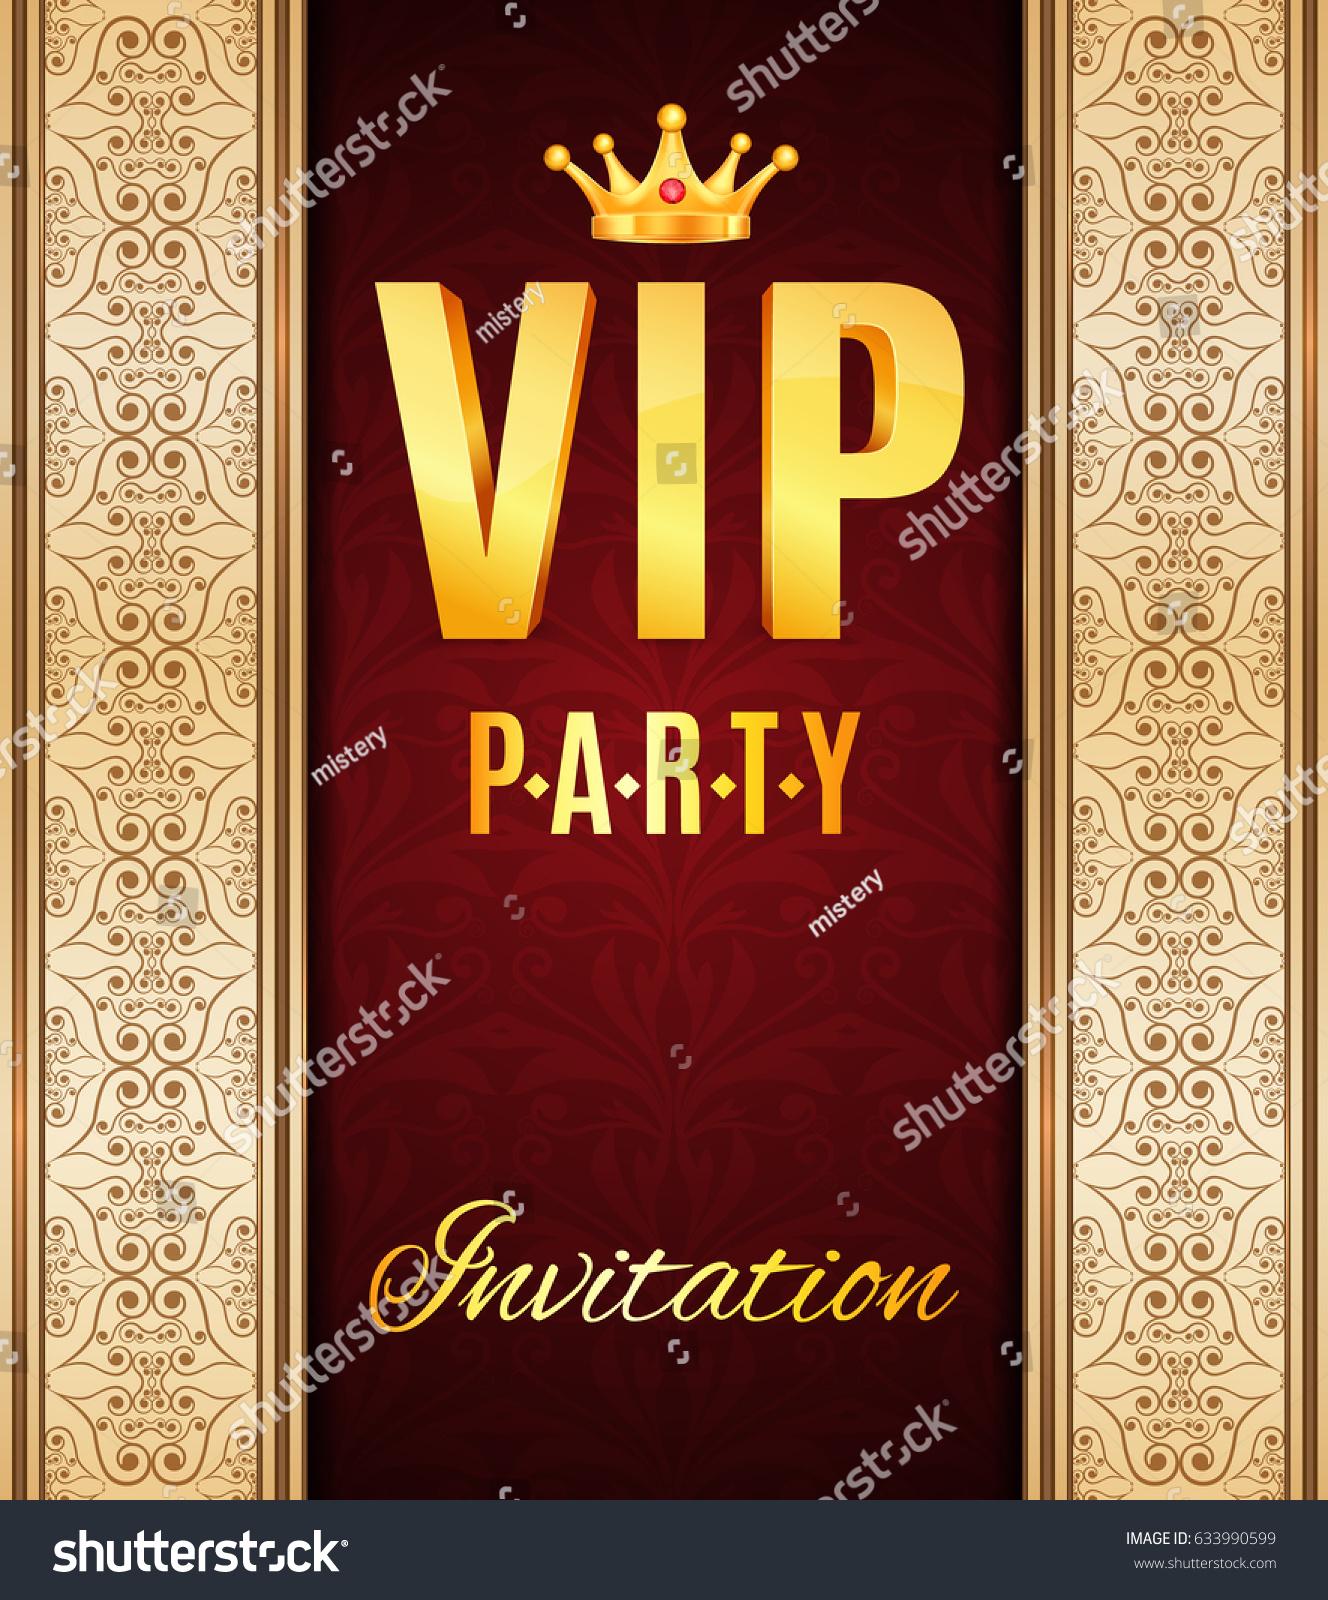 VIP Elegant Card Vip Party Invitation Stock Vector 633990599 ...